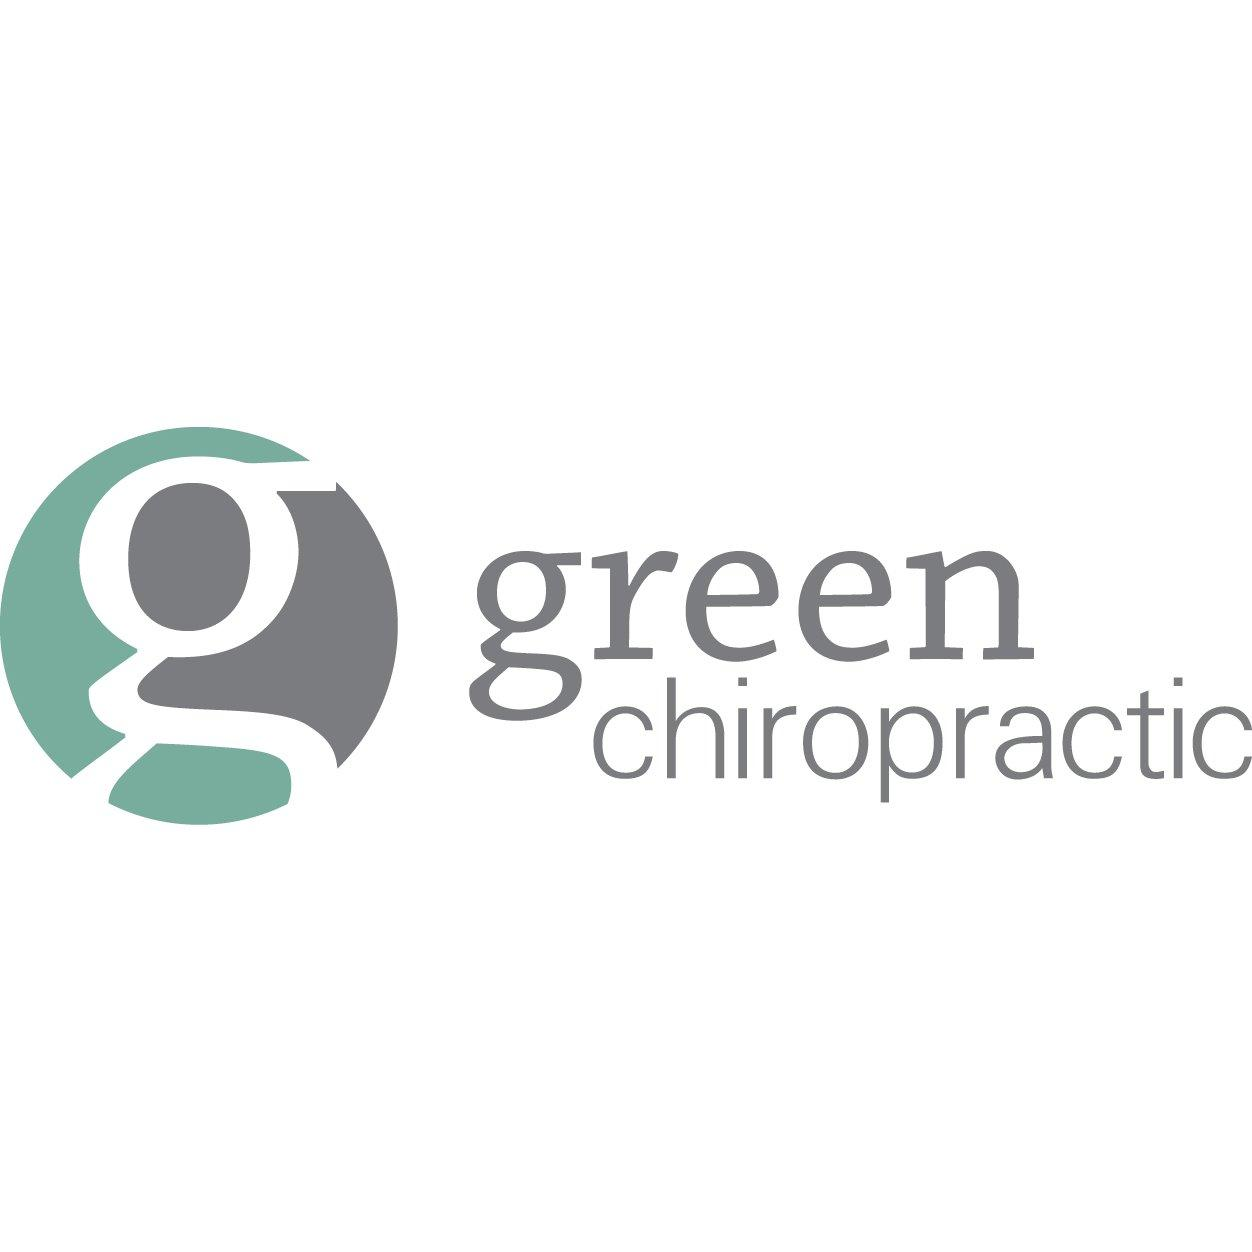 Green Chiropractic Corrections